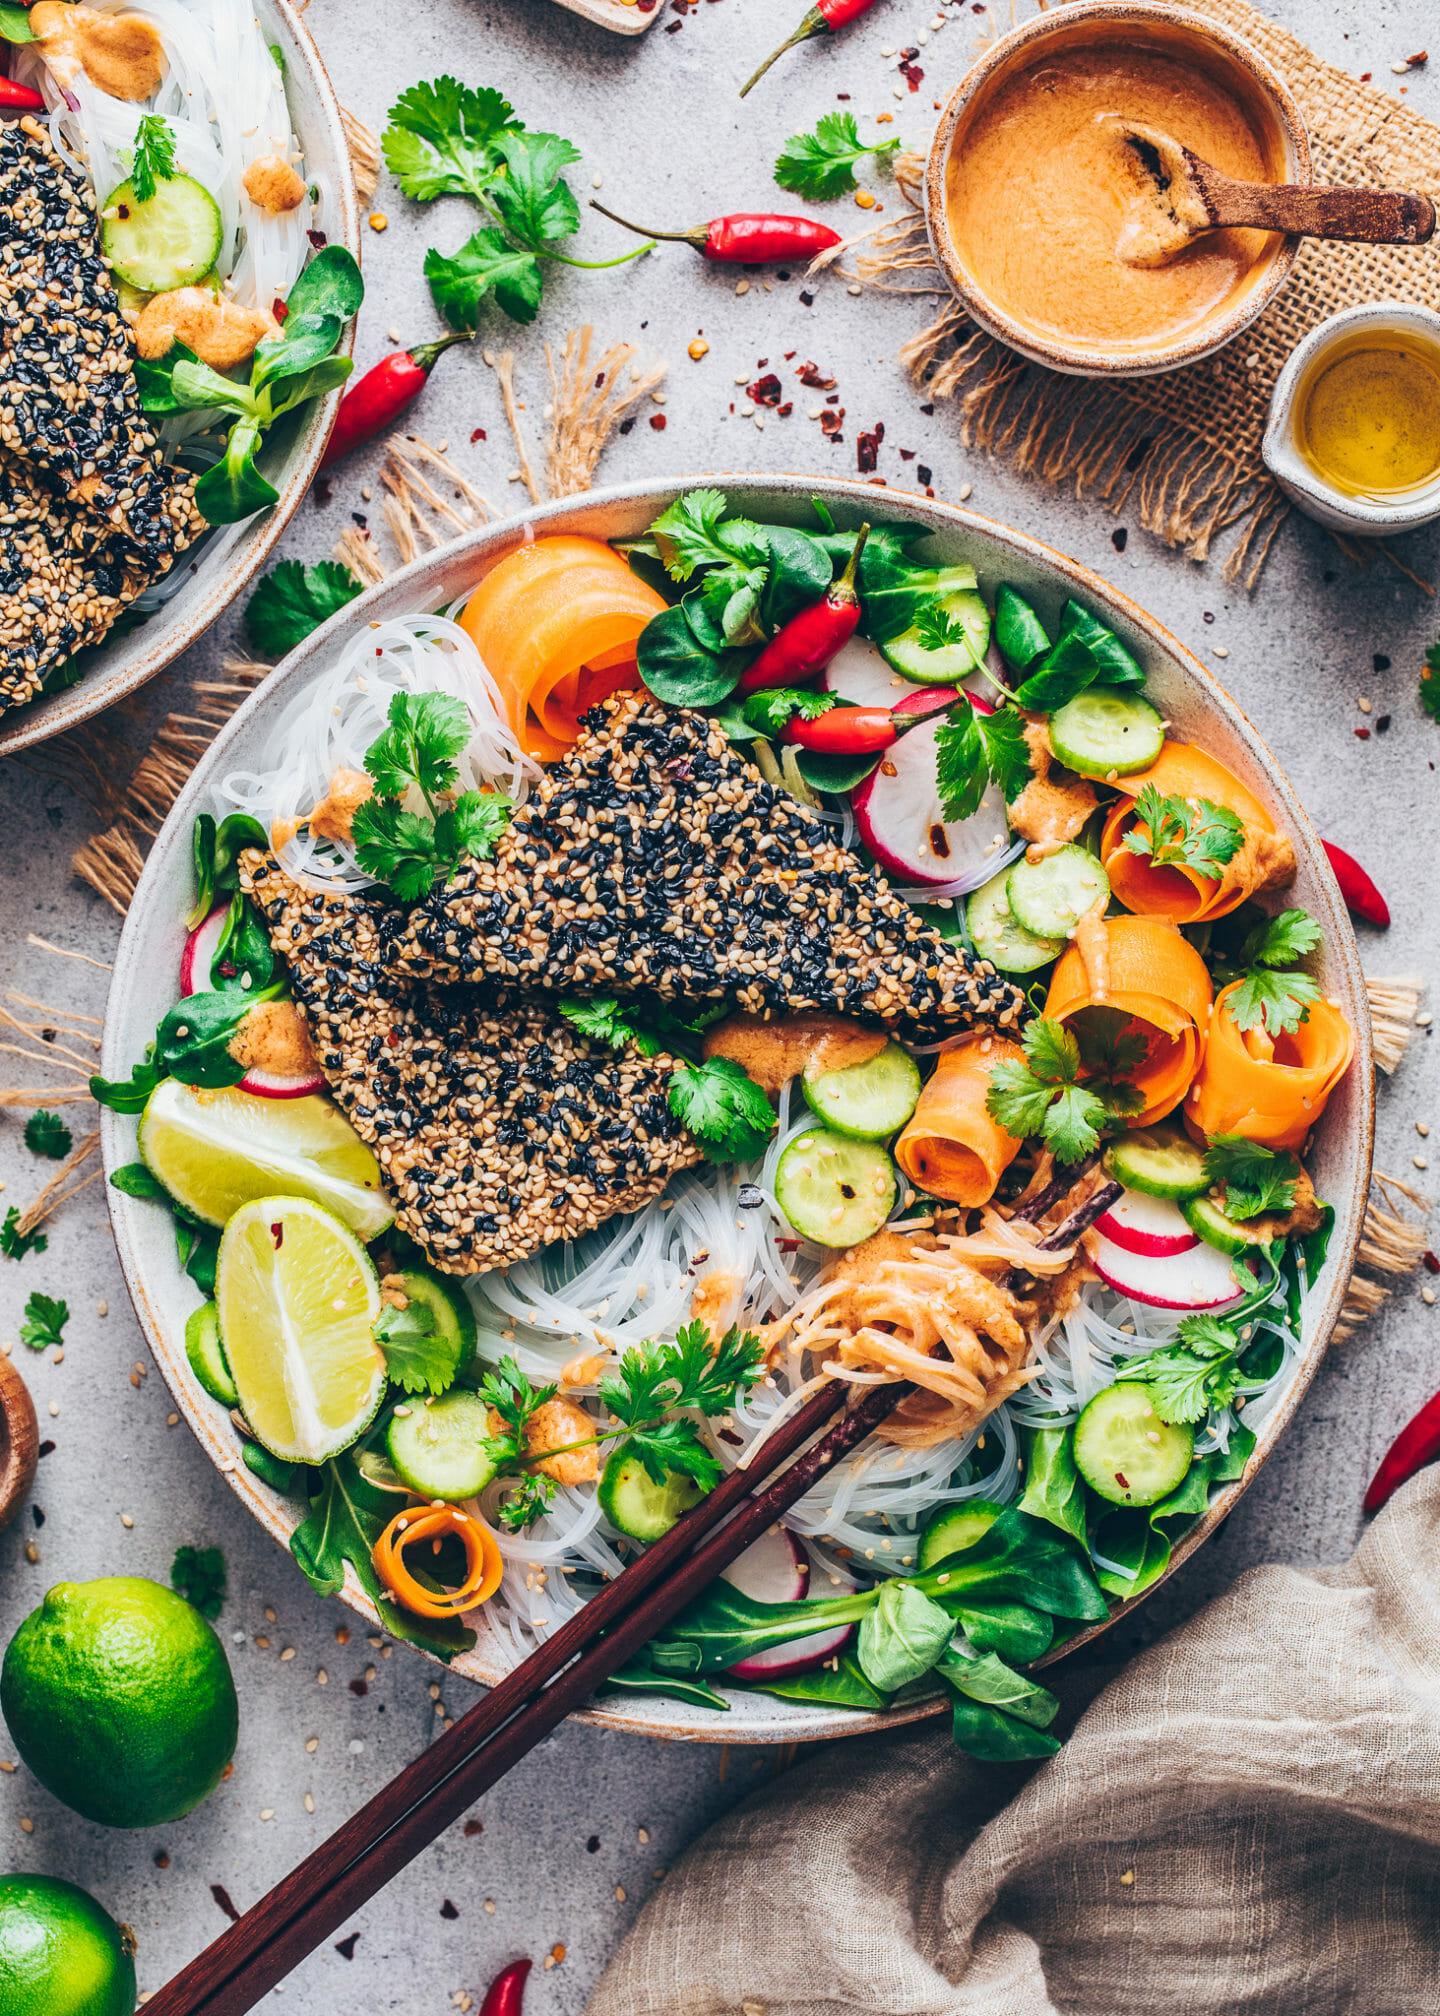 Vietnamese Rice Noodle Salad with Sesame Tofu and Peanut Sauce